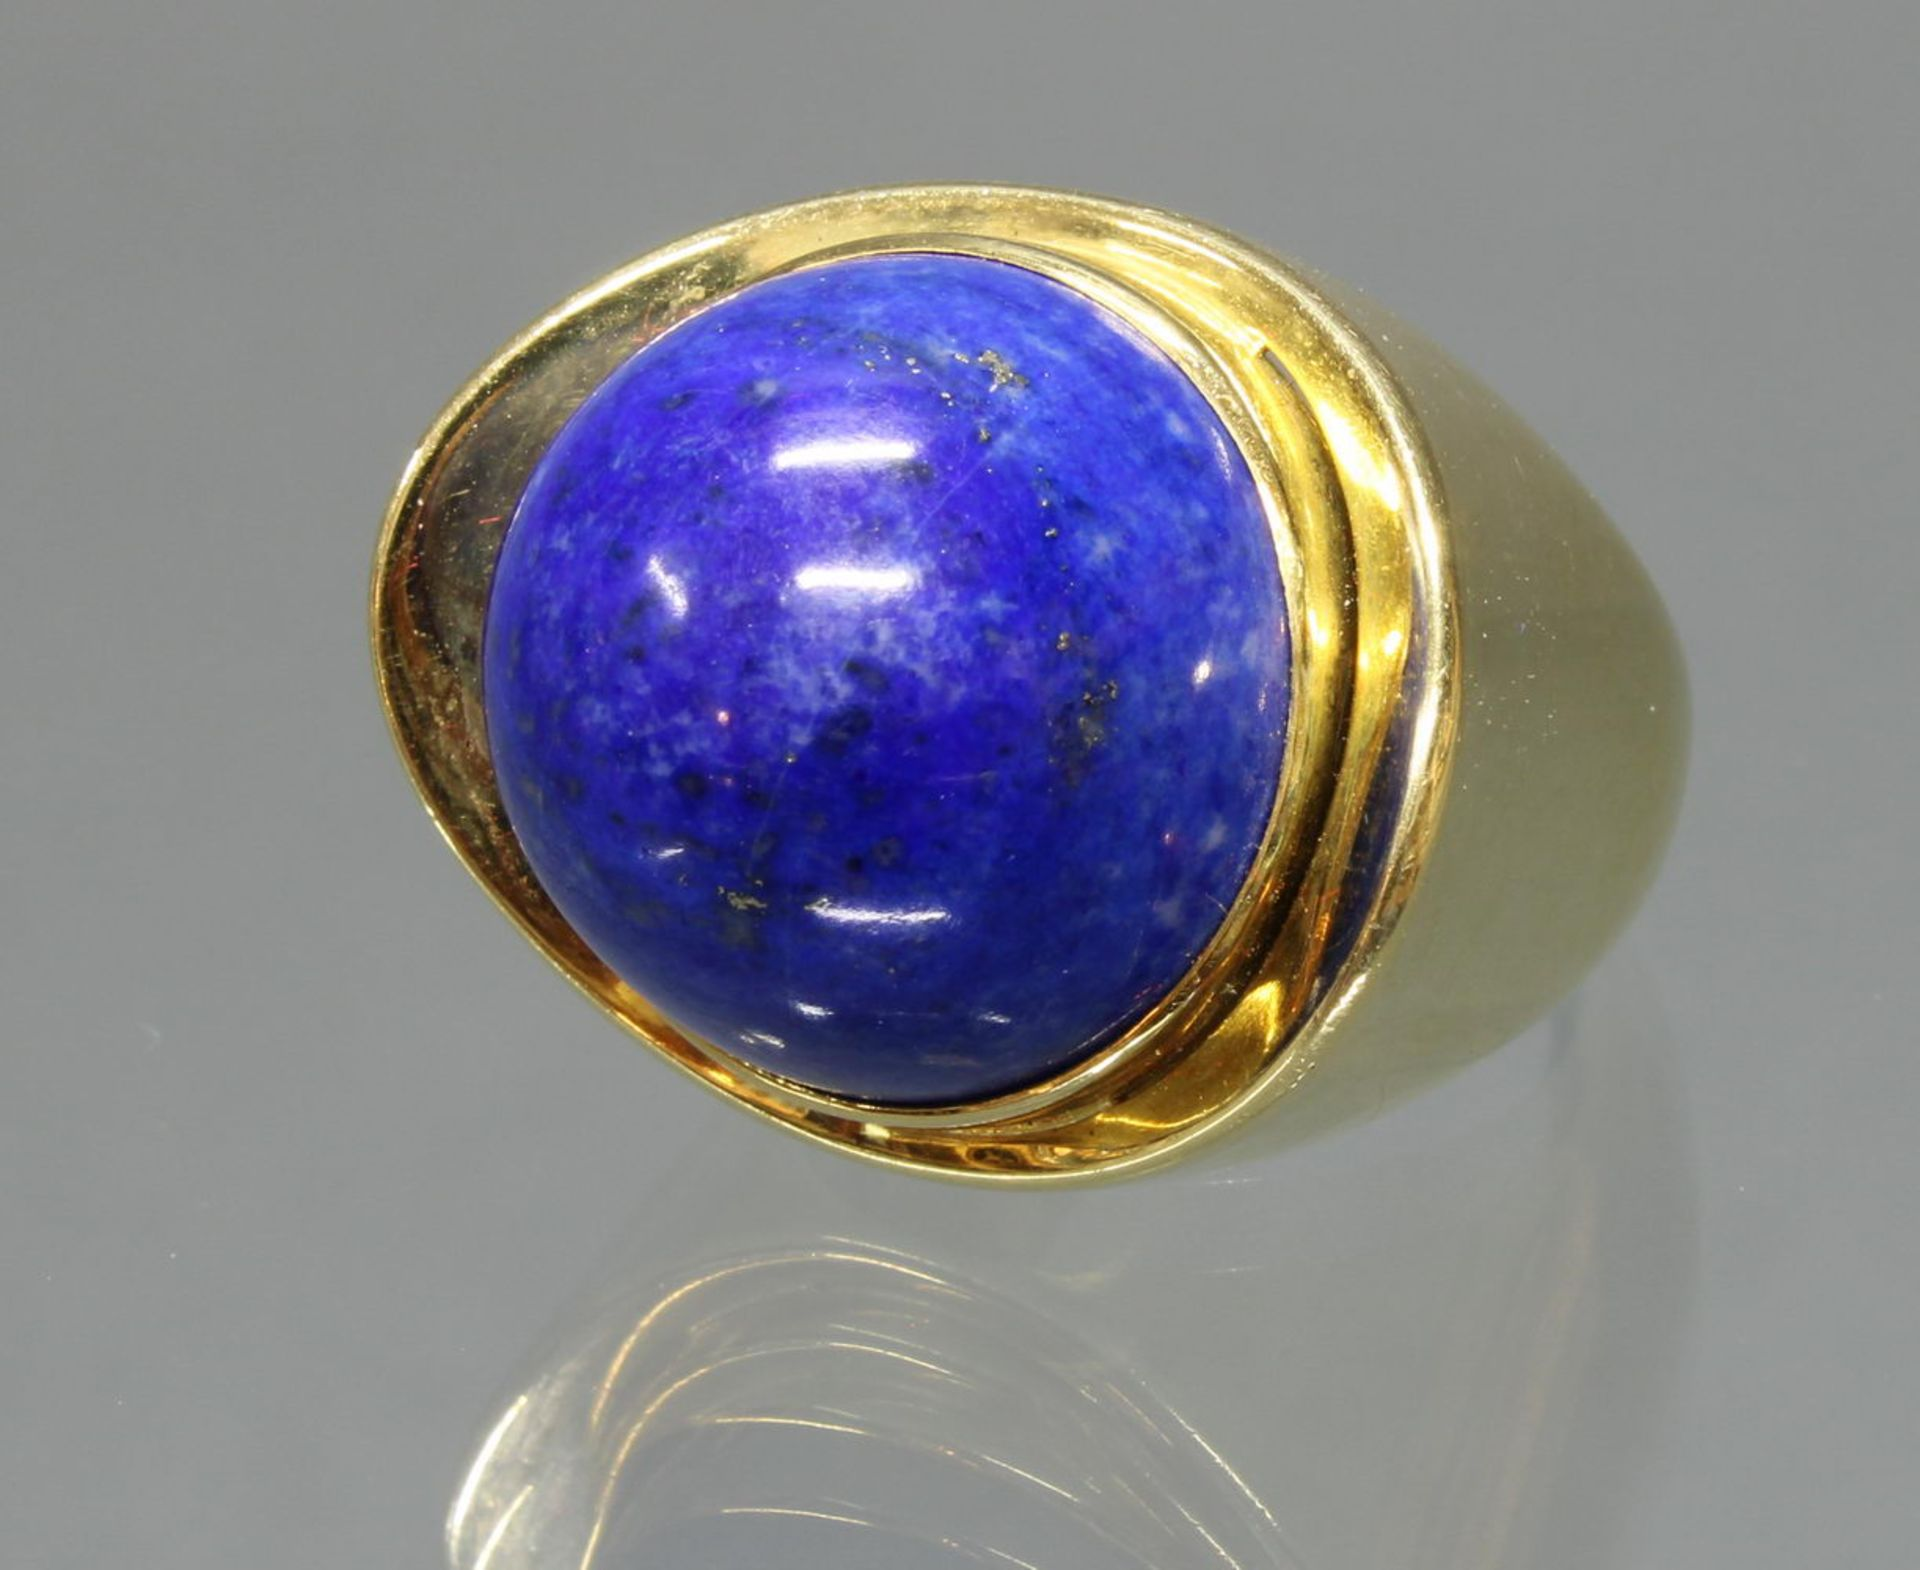 Ring, 1950er/1960er Jahre, GG 750, 1 Lapislazuli-Cabochon 17.6 x 17.2 x 11.9 mm, 22.5 g, RM 16.5, i